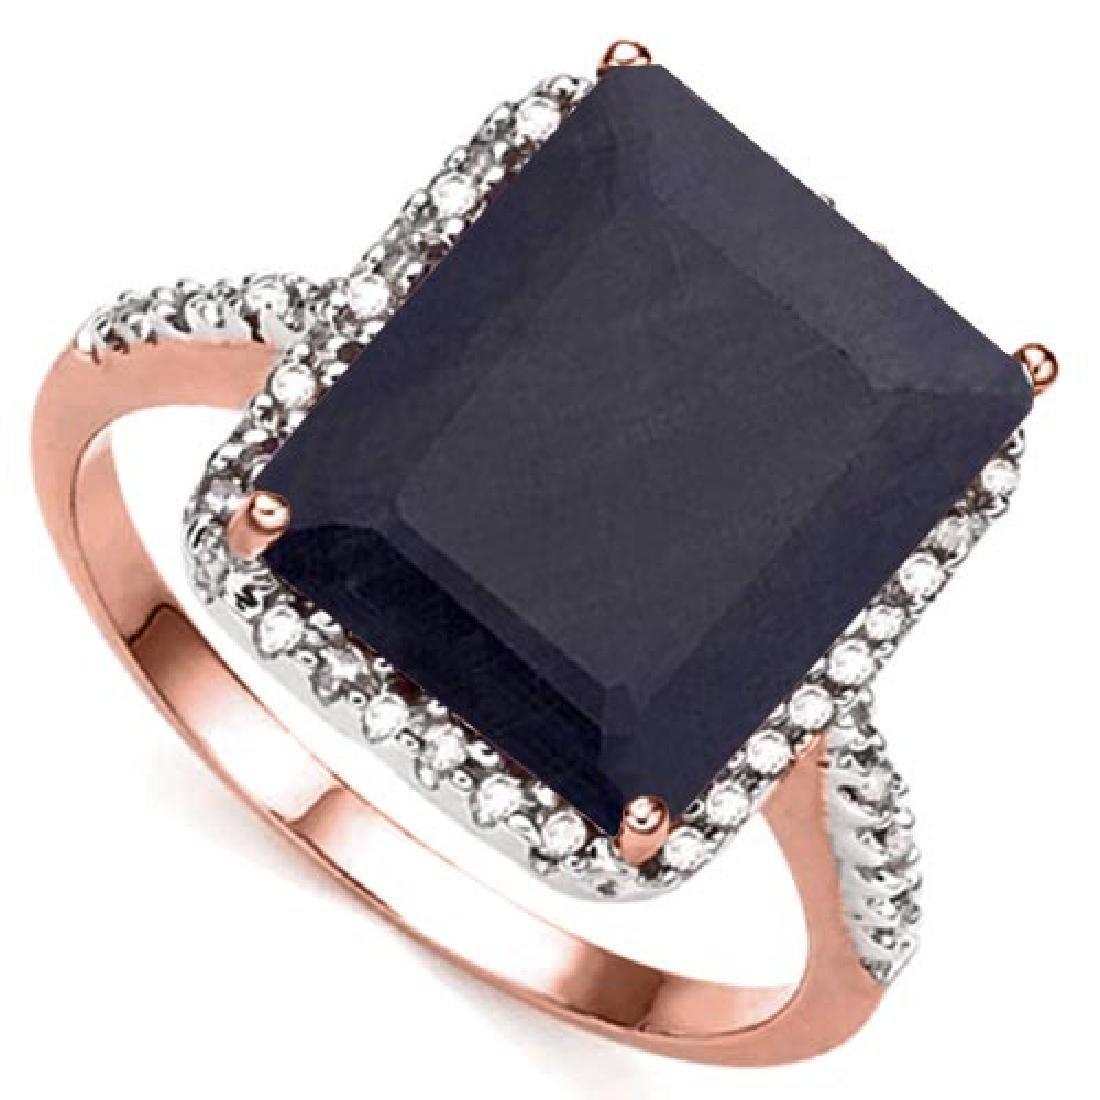 7.03 CTW BLACK SAPPHIRE & (22 PCS) DIAMOND 10KT SOLID R